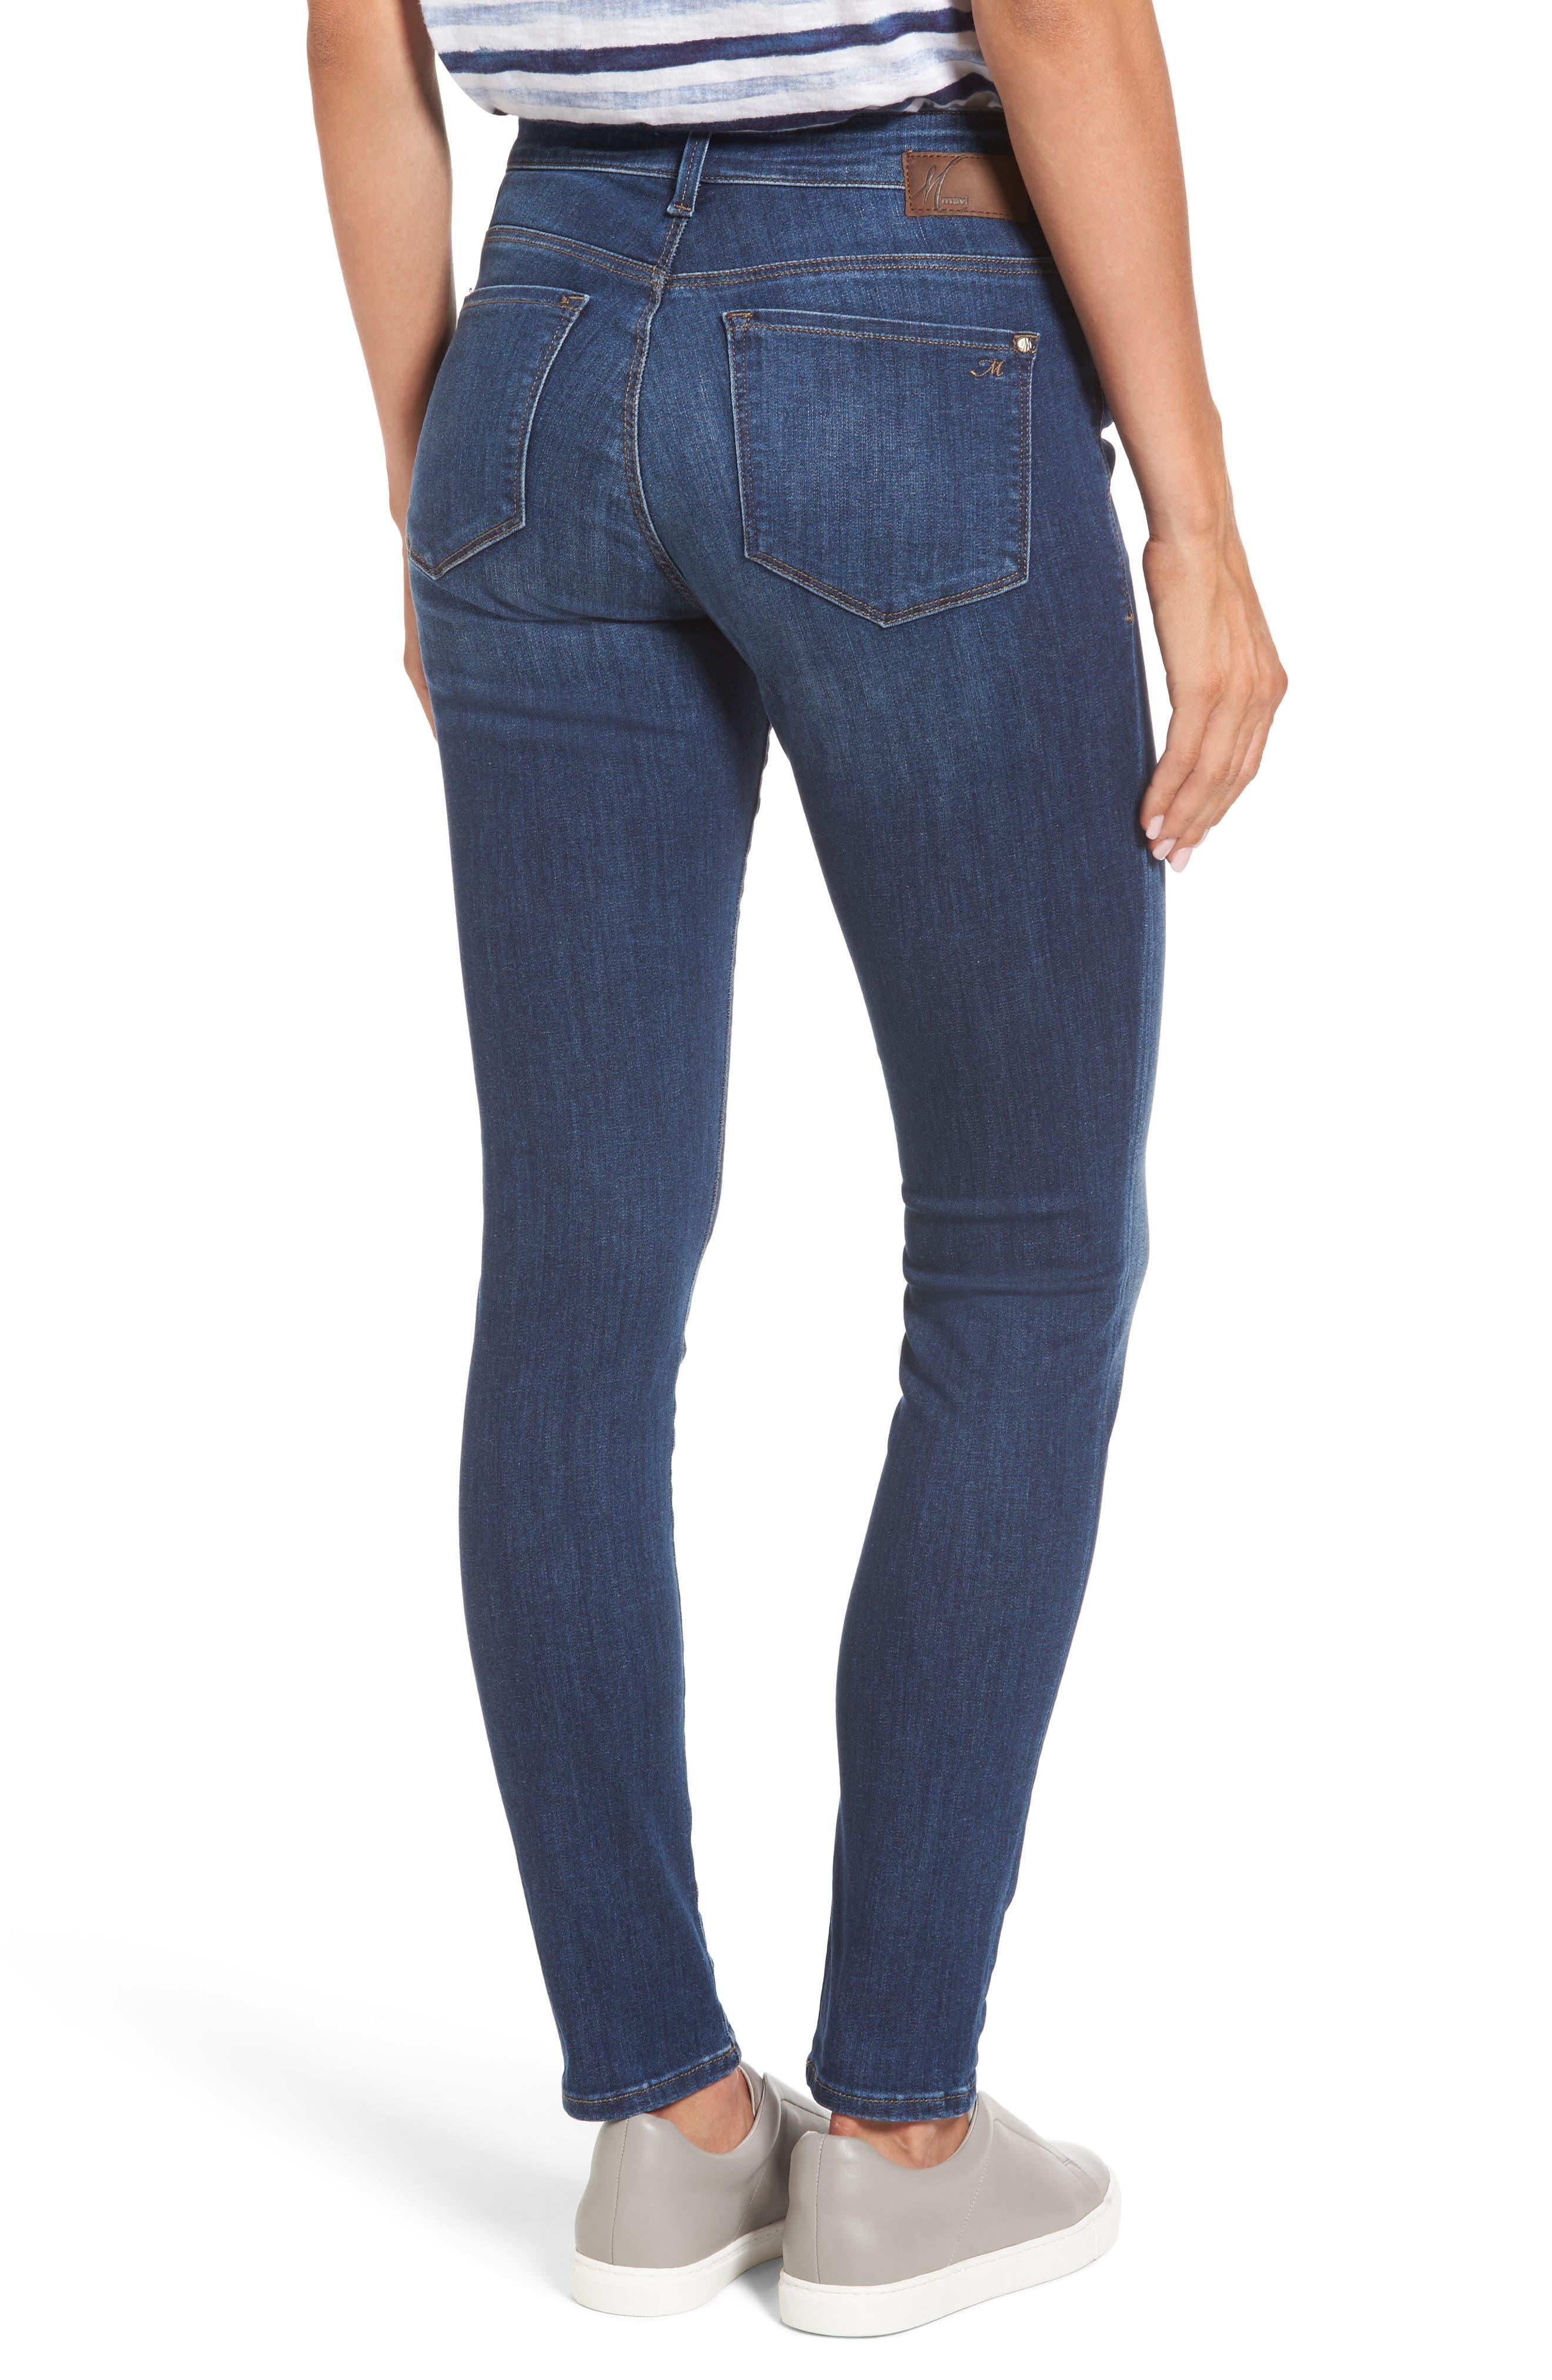 Alissa Super Skinny Jeans,                             Alternate thumbnail 2, color,                             401